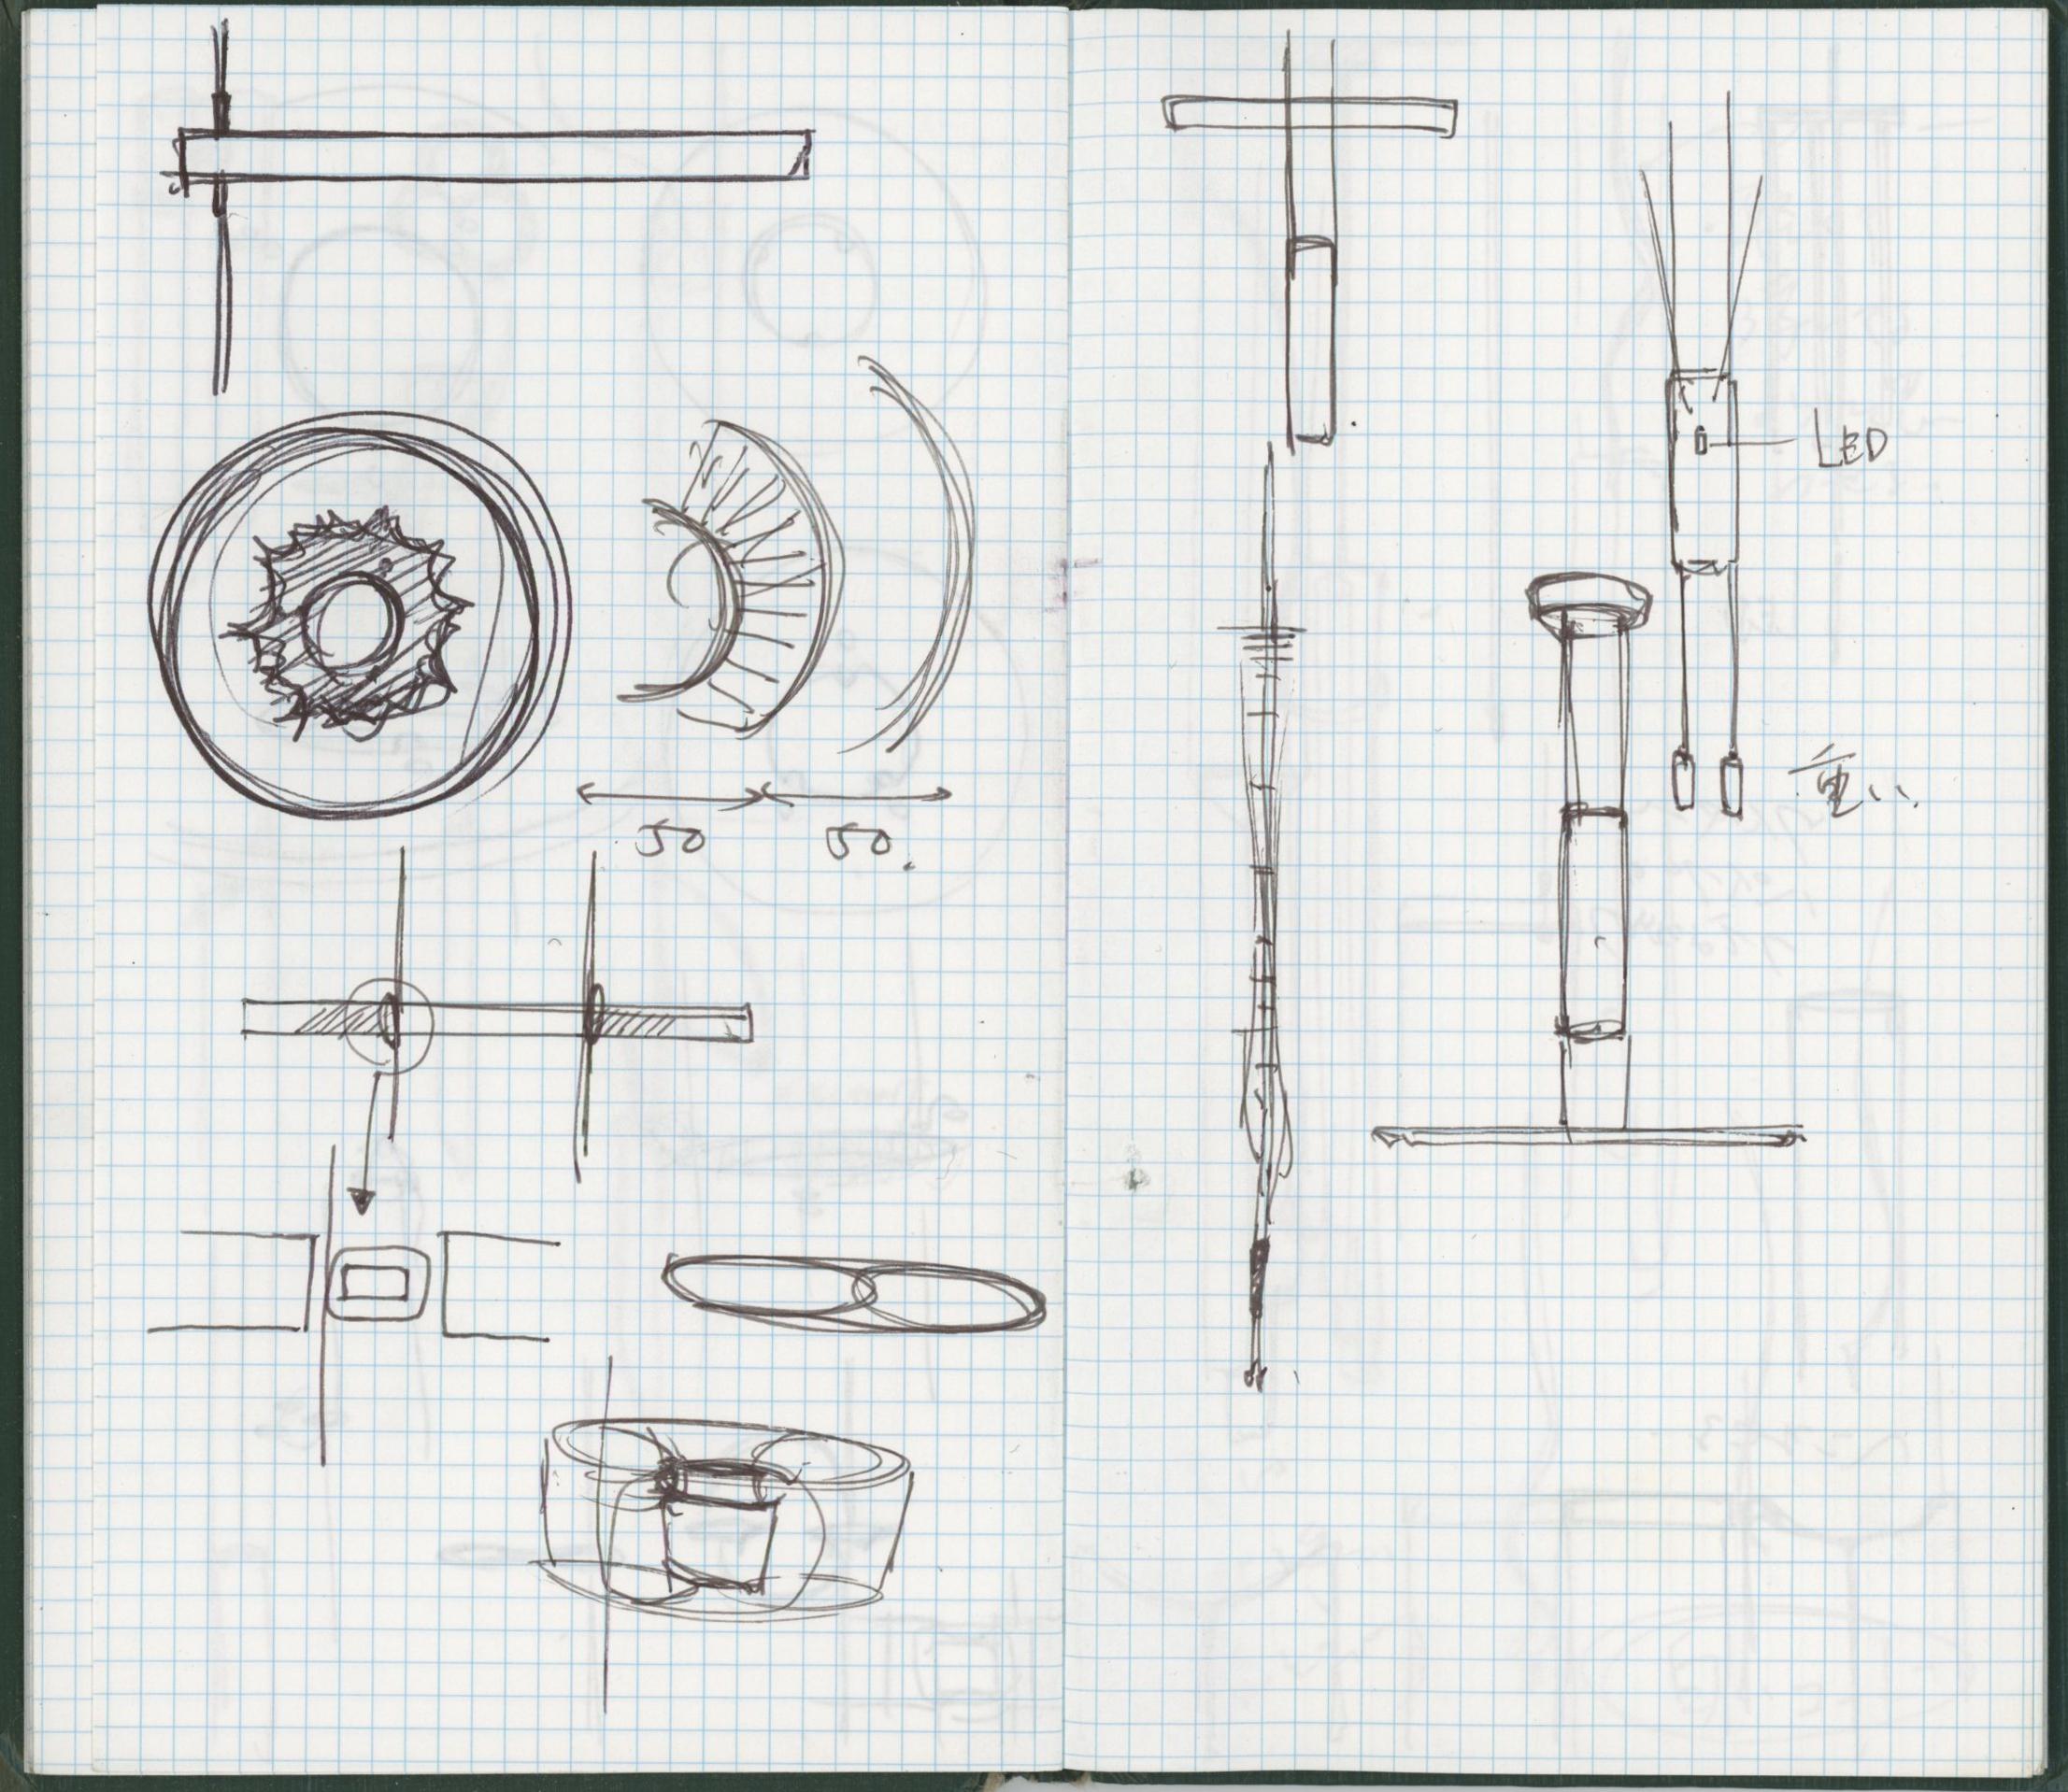 img628.jpg